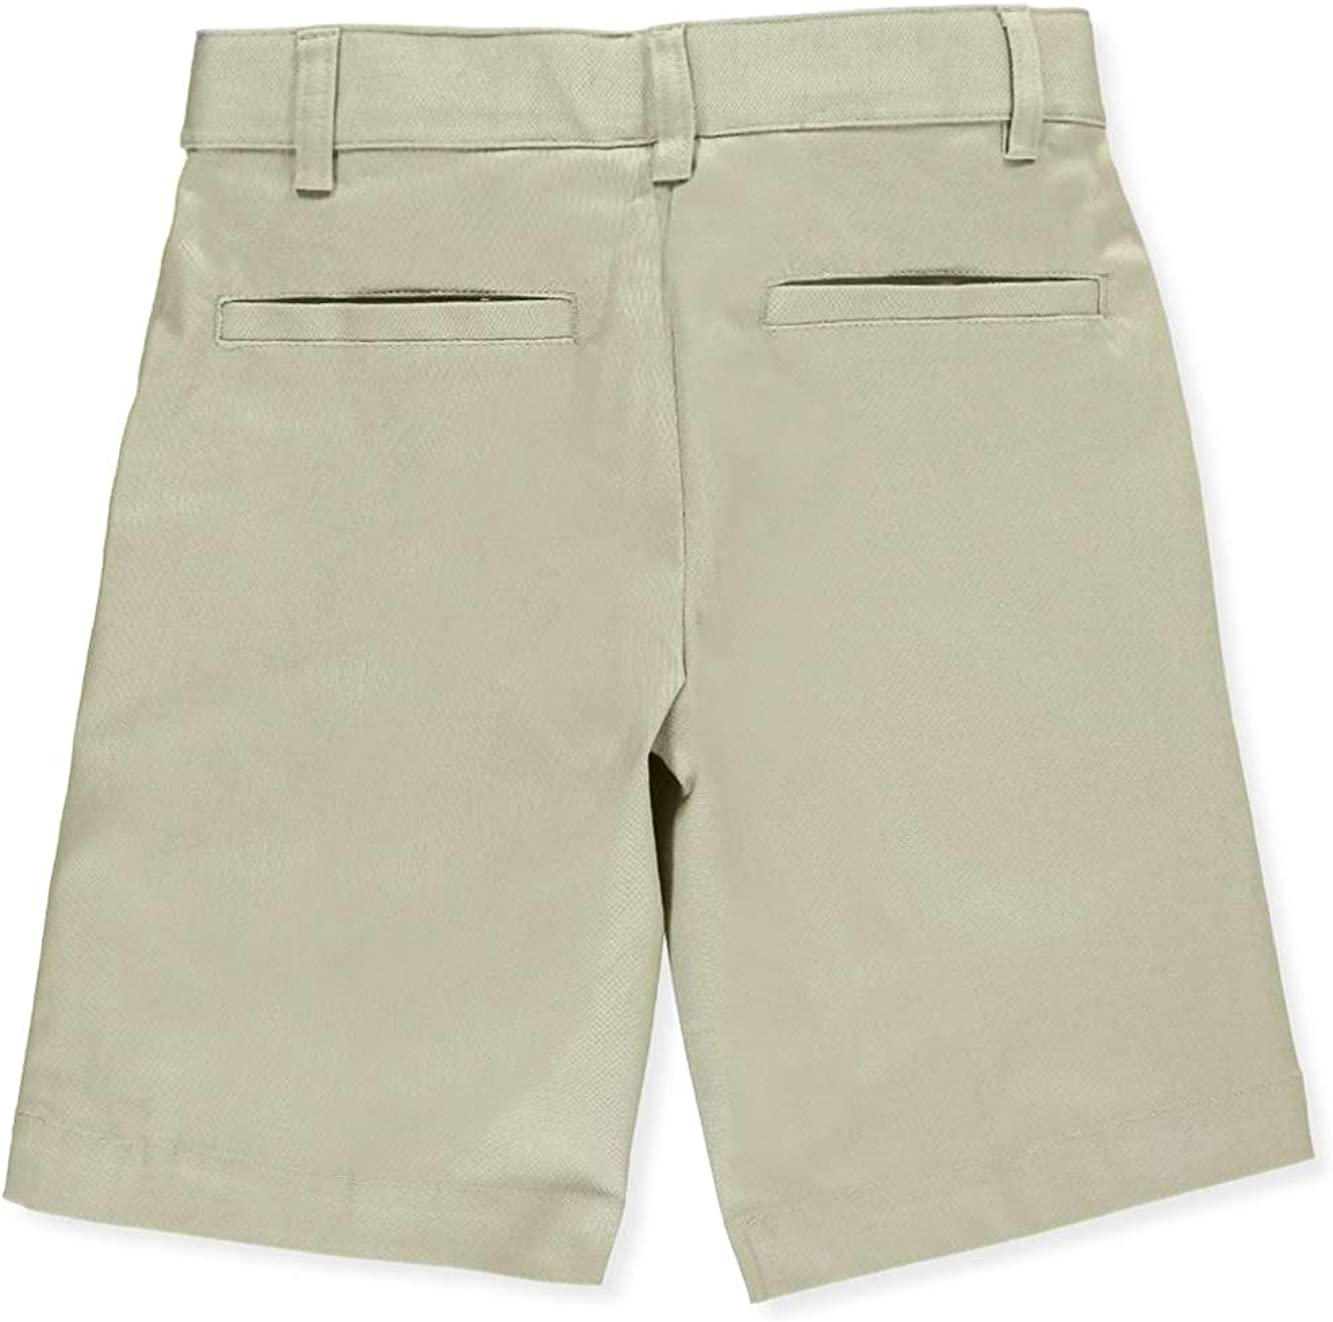 Universal Girls Flat Front Shorts